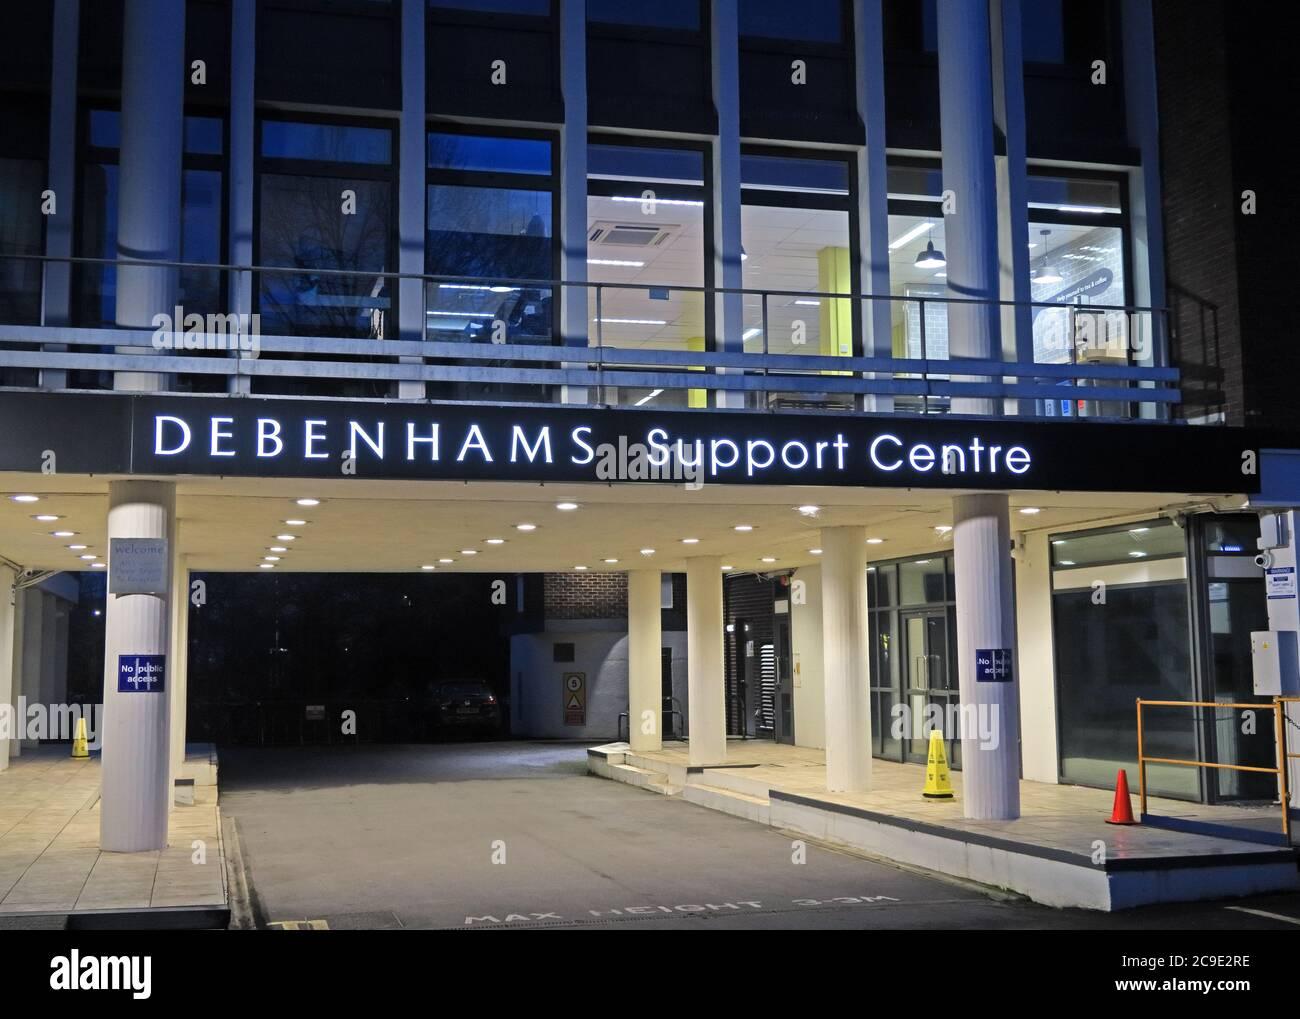 Debenhams Support Centre,high street retail,Bedford House, Park St, Taunton TA1 4DB at dusk Stock Photo